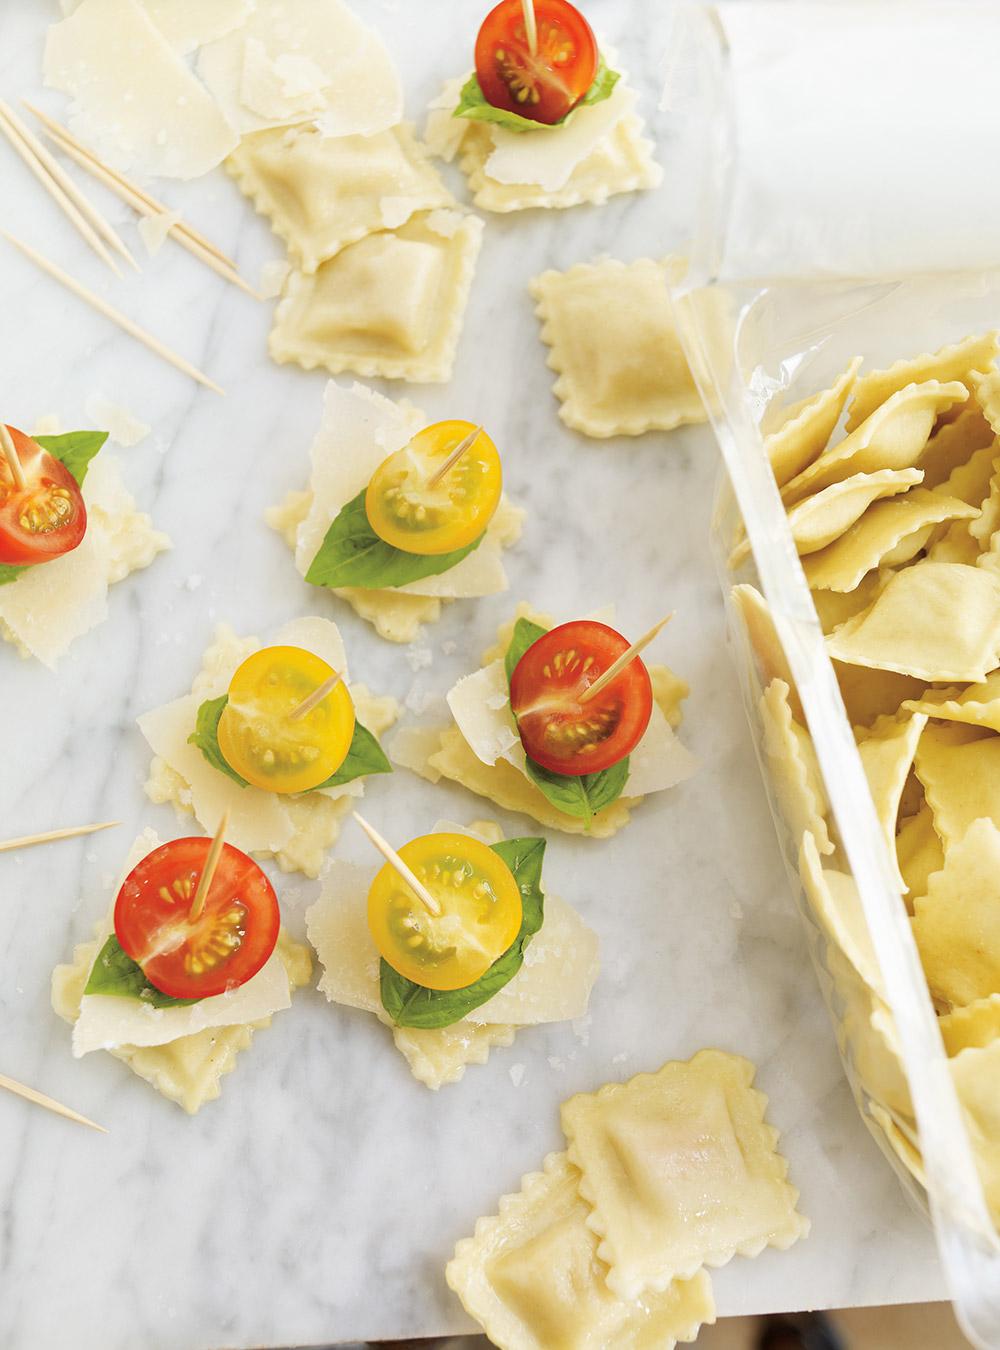 Brochettes de ravioli, tomates cerises et parmesan | ricardo